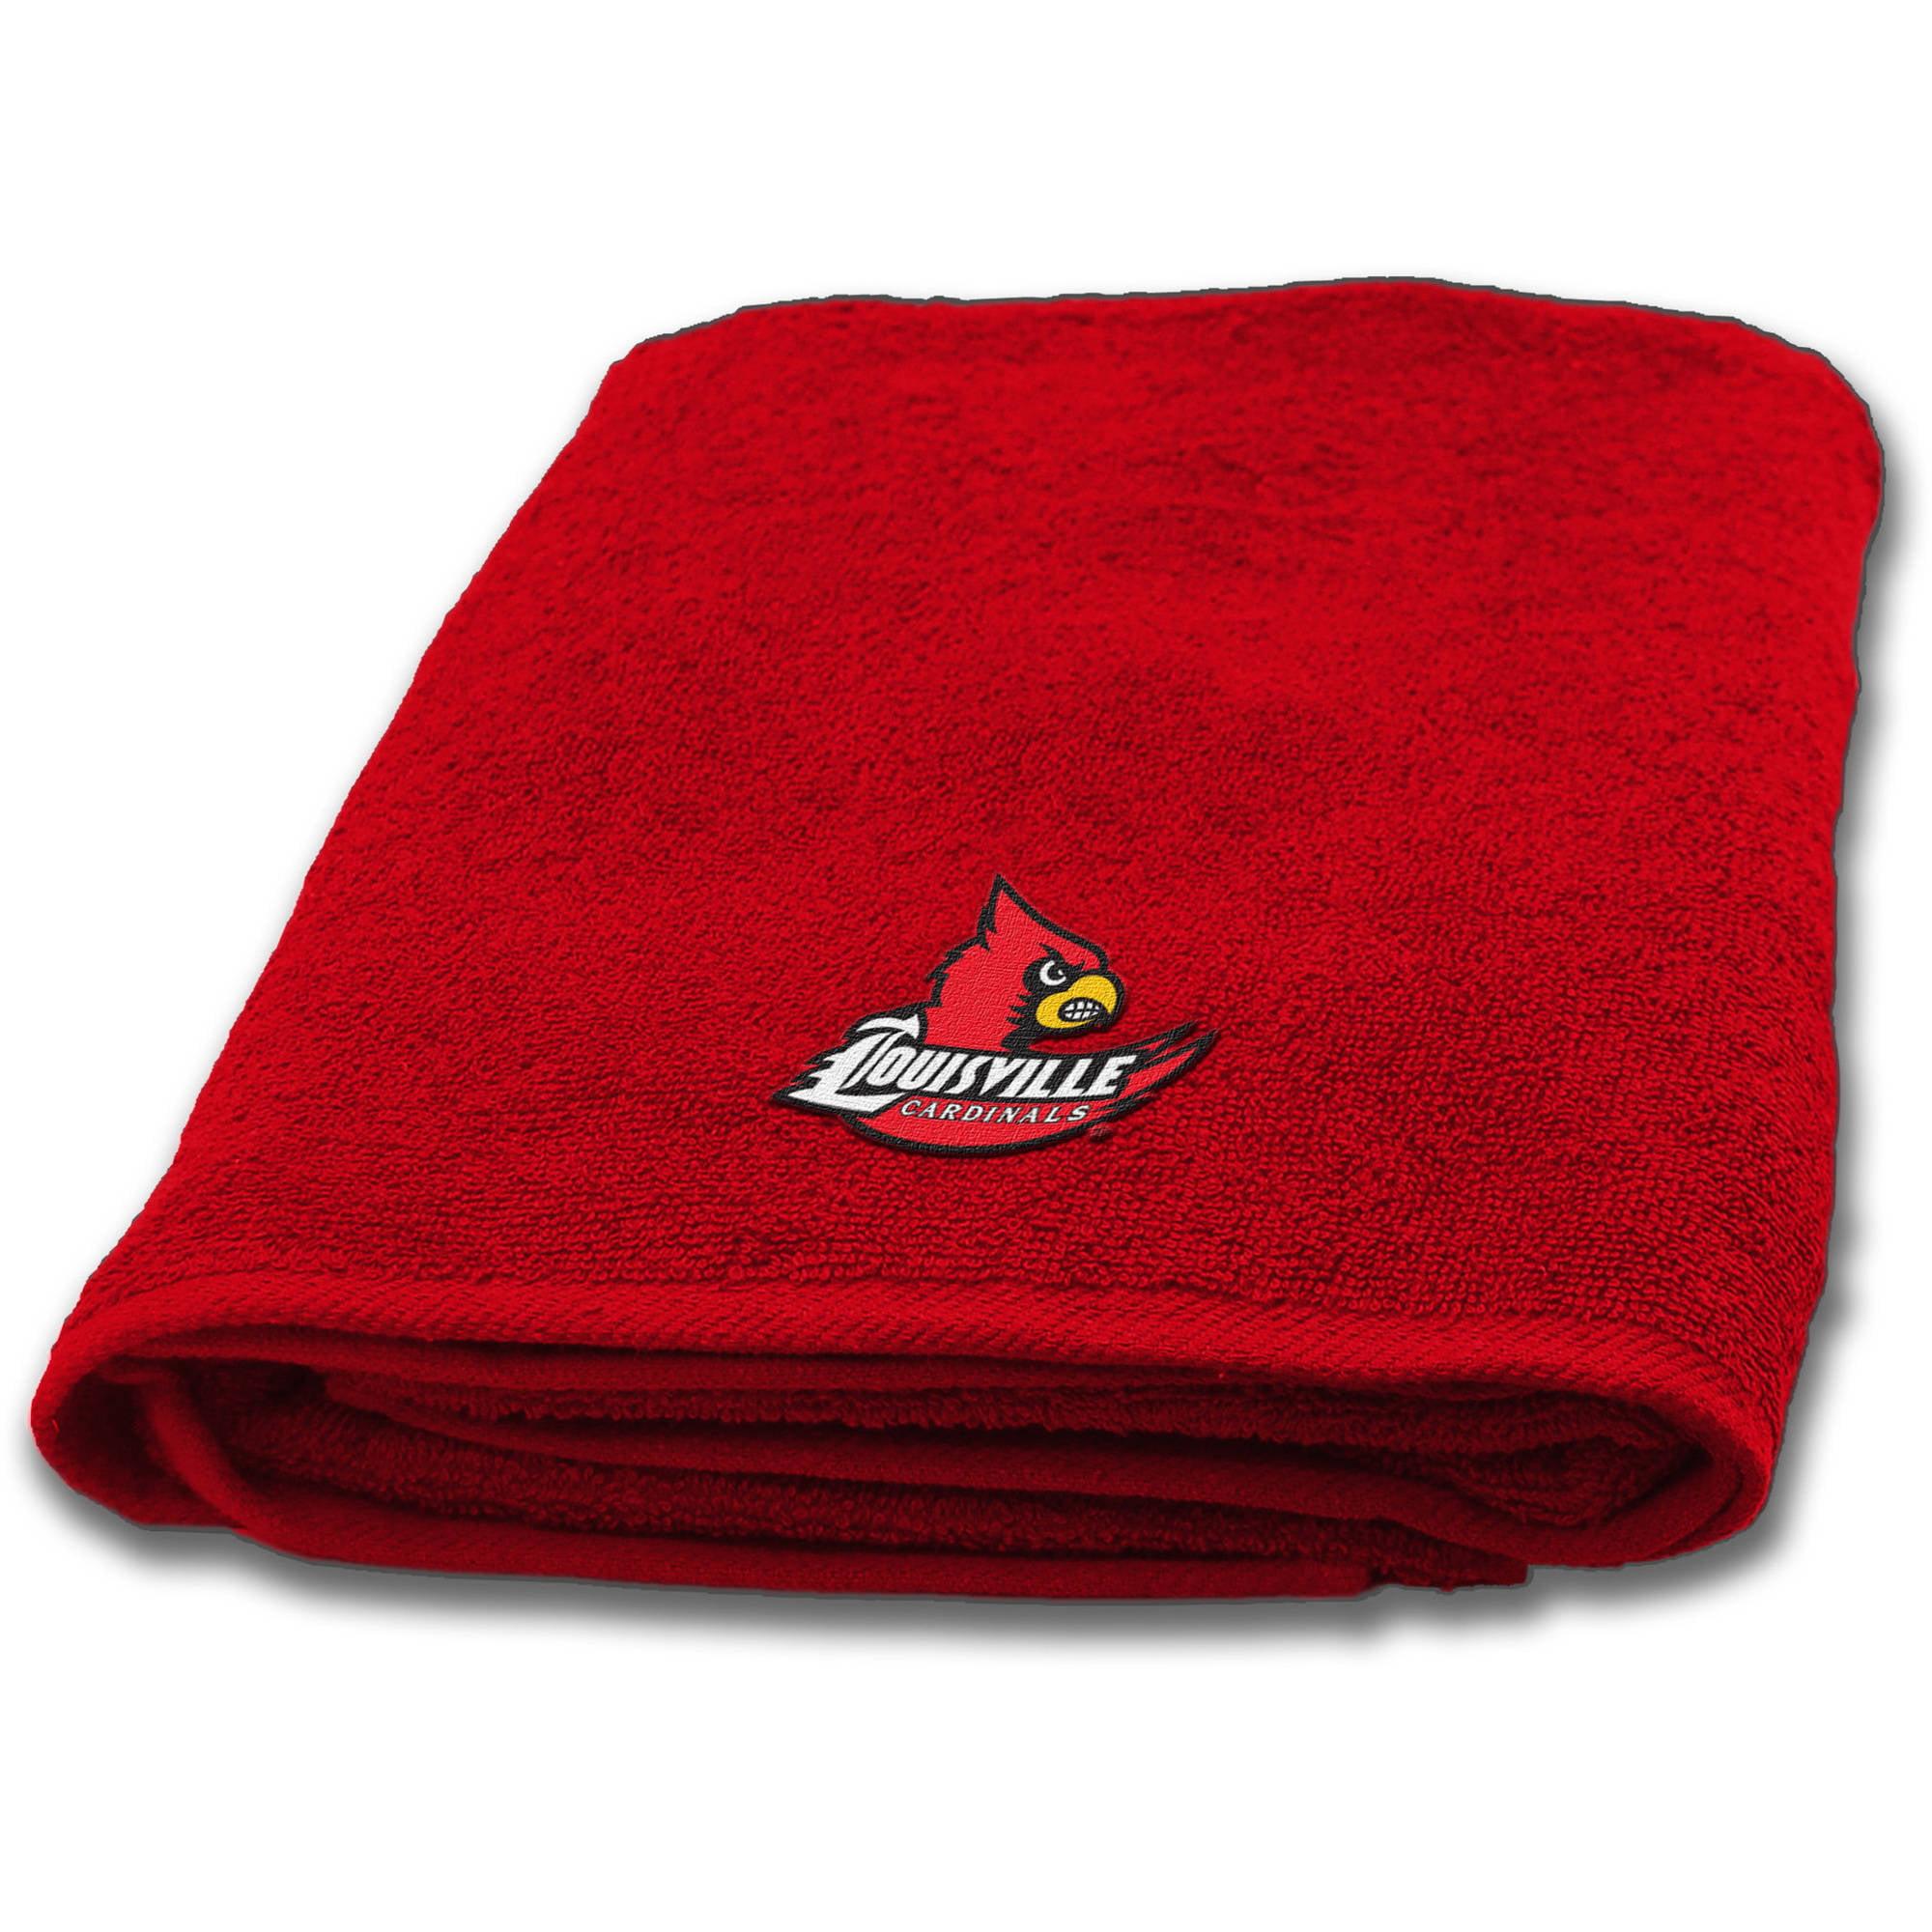 "NCAA Louisville Cardinals 25"" x 50"" Applique Bath Towel, 1 Each"